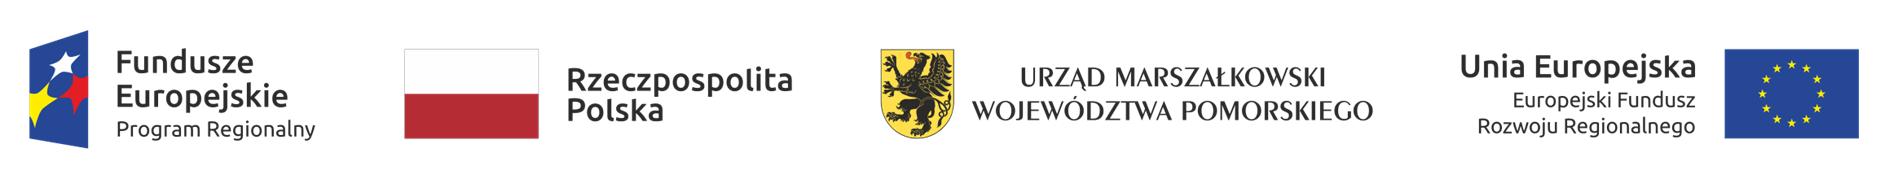 logo fundusze [1889x179]